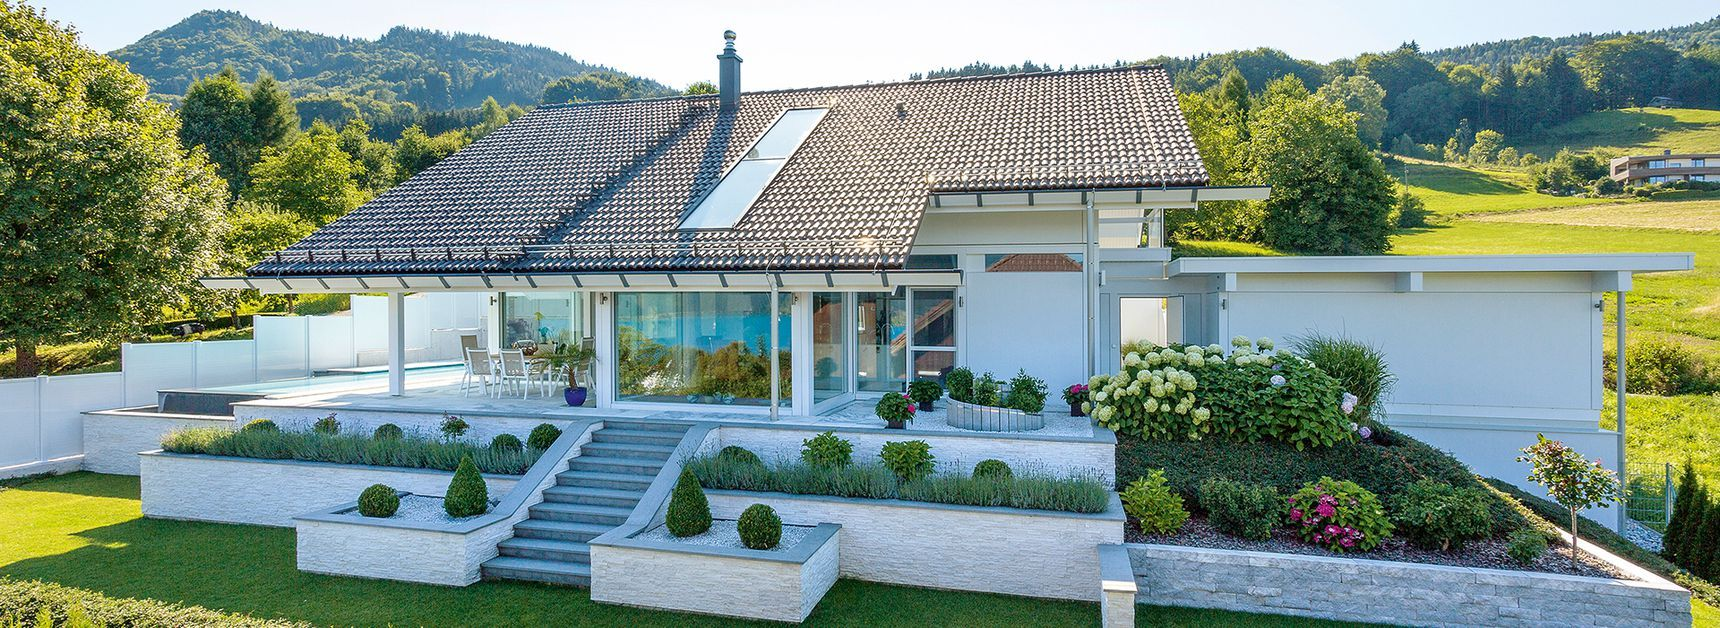 musterh user moderne fachwerkarchitektur musterhauszentrum huf haus haus pinterest. Black Bedroom Furniture Sets. Home Design Ideas